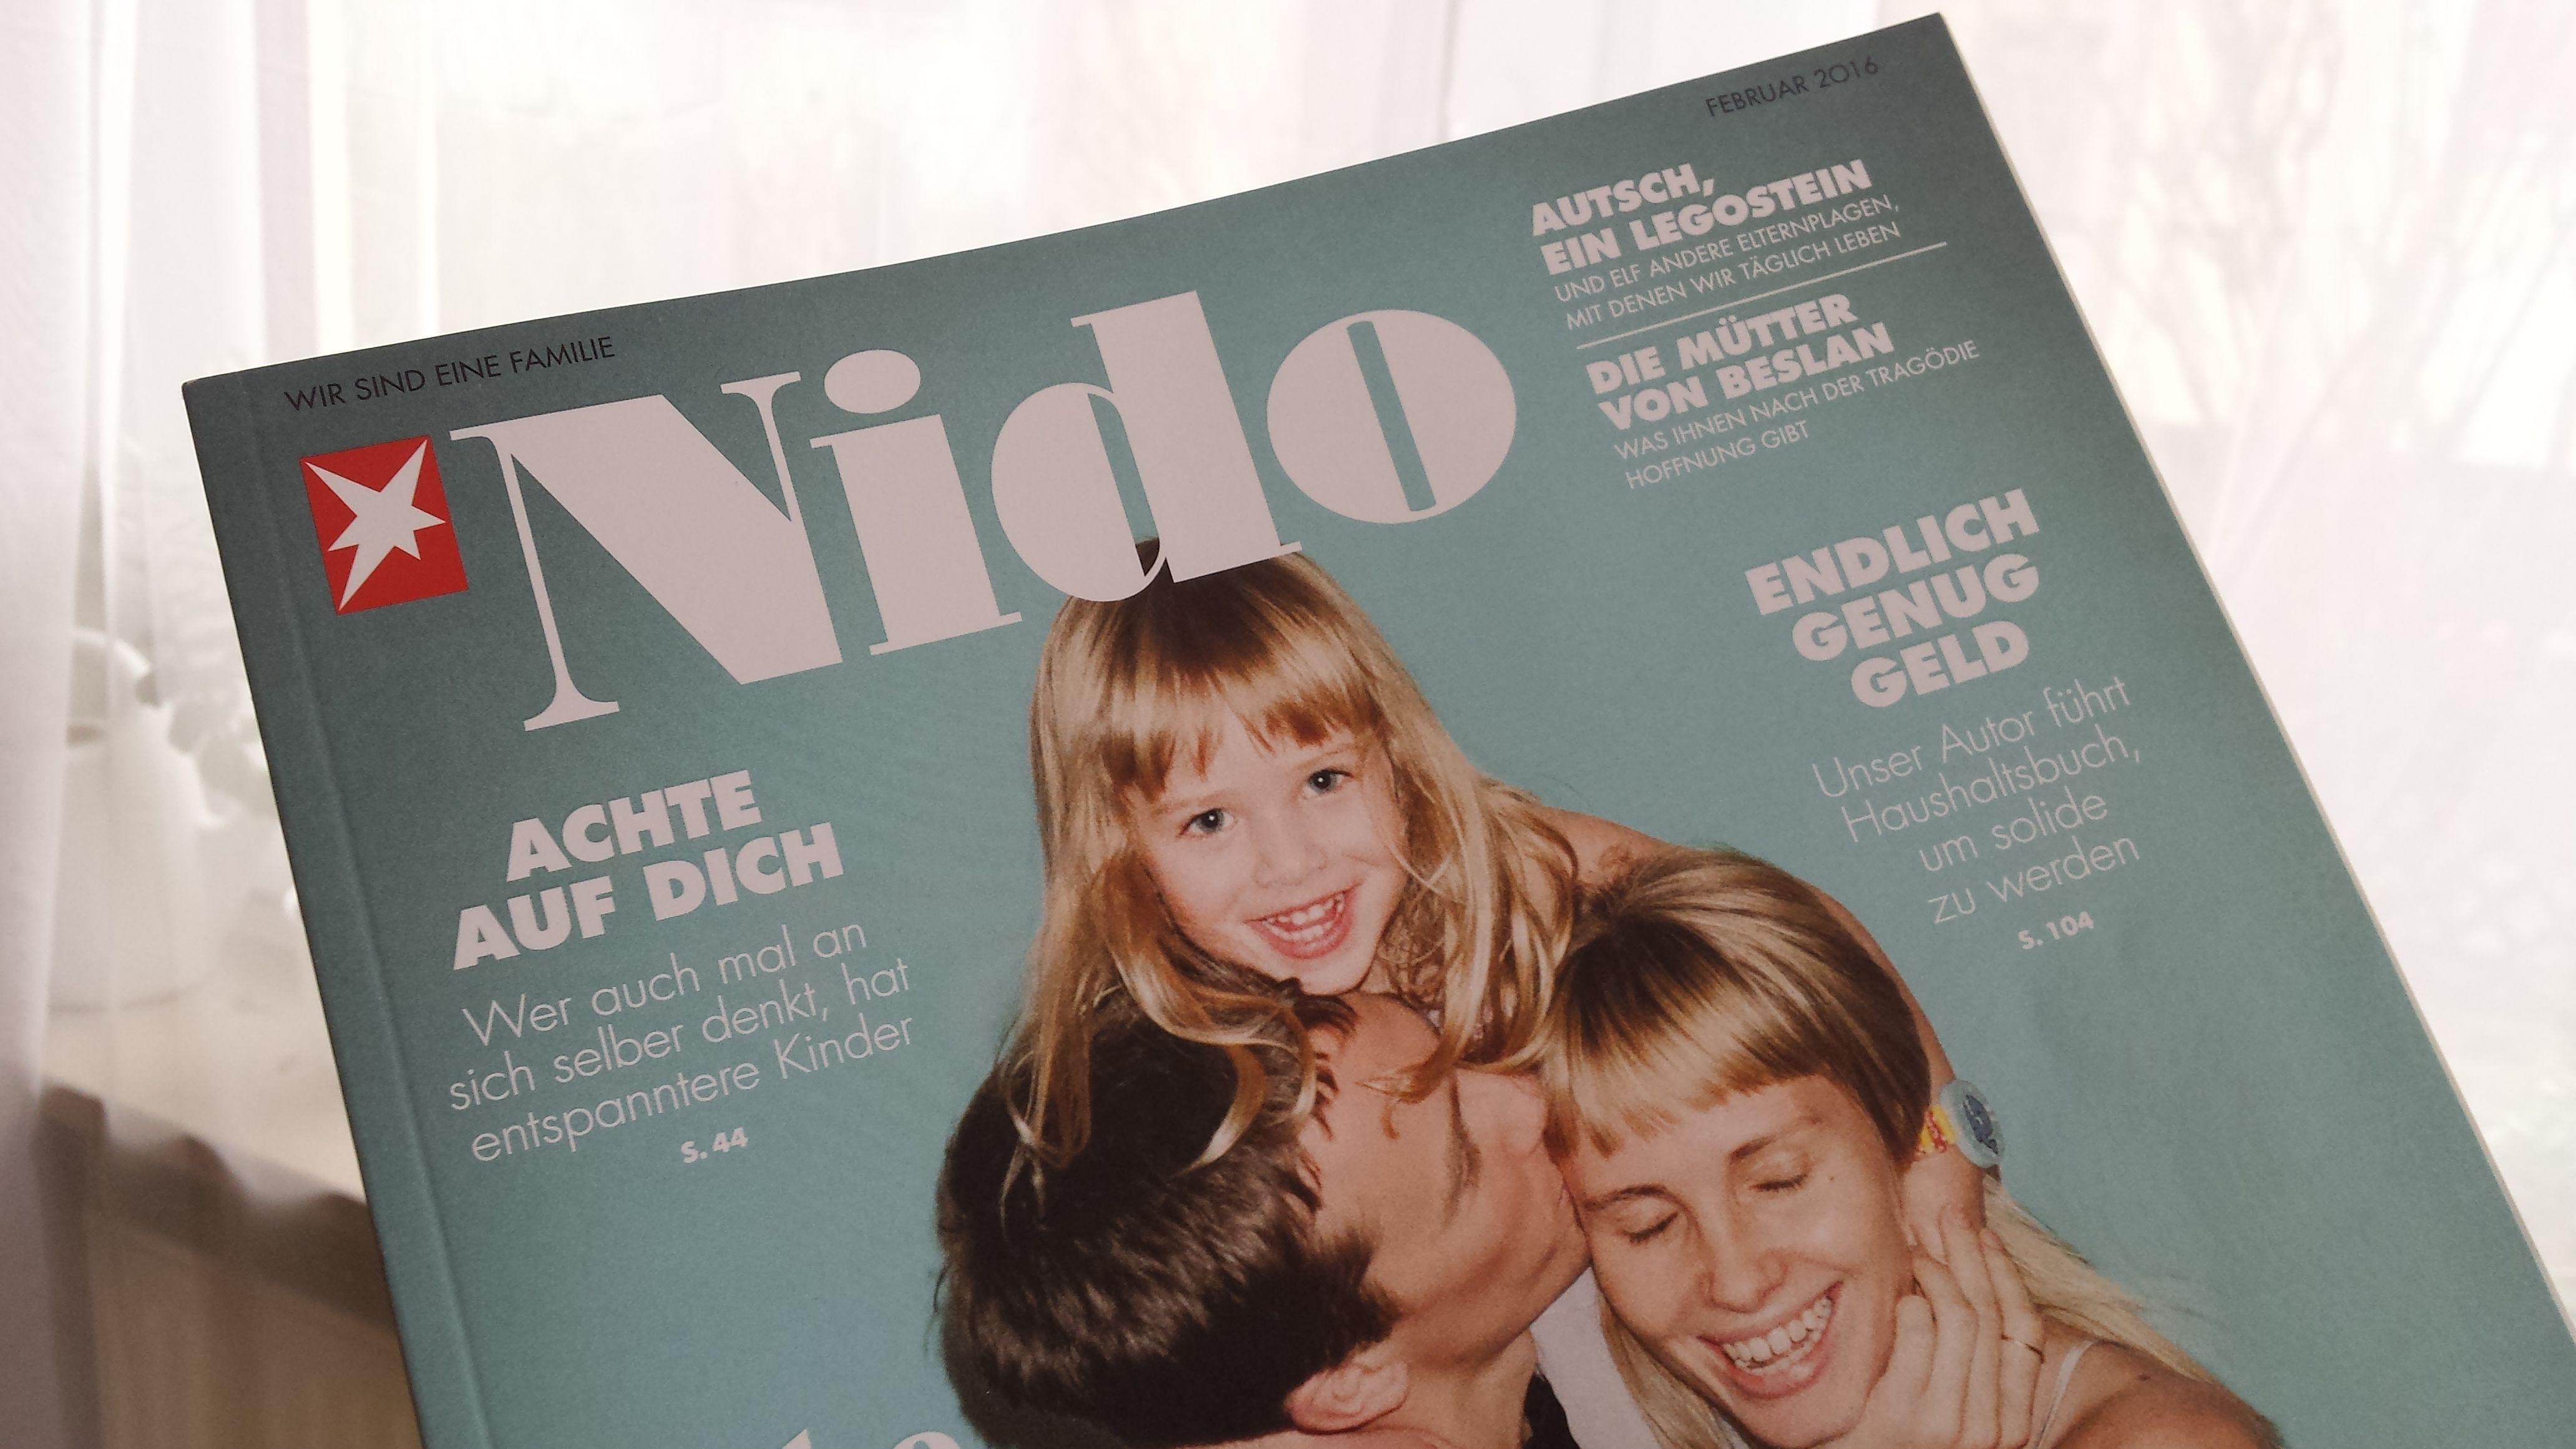 Nido - Elternmagazin - Wie wir ins Heft kamen 2016-01-29_72dpi